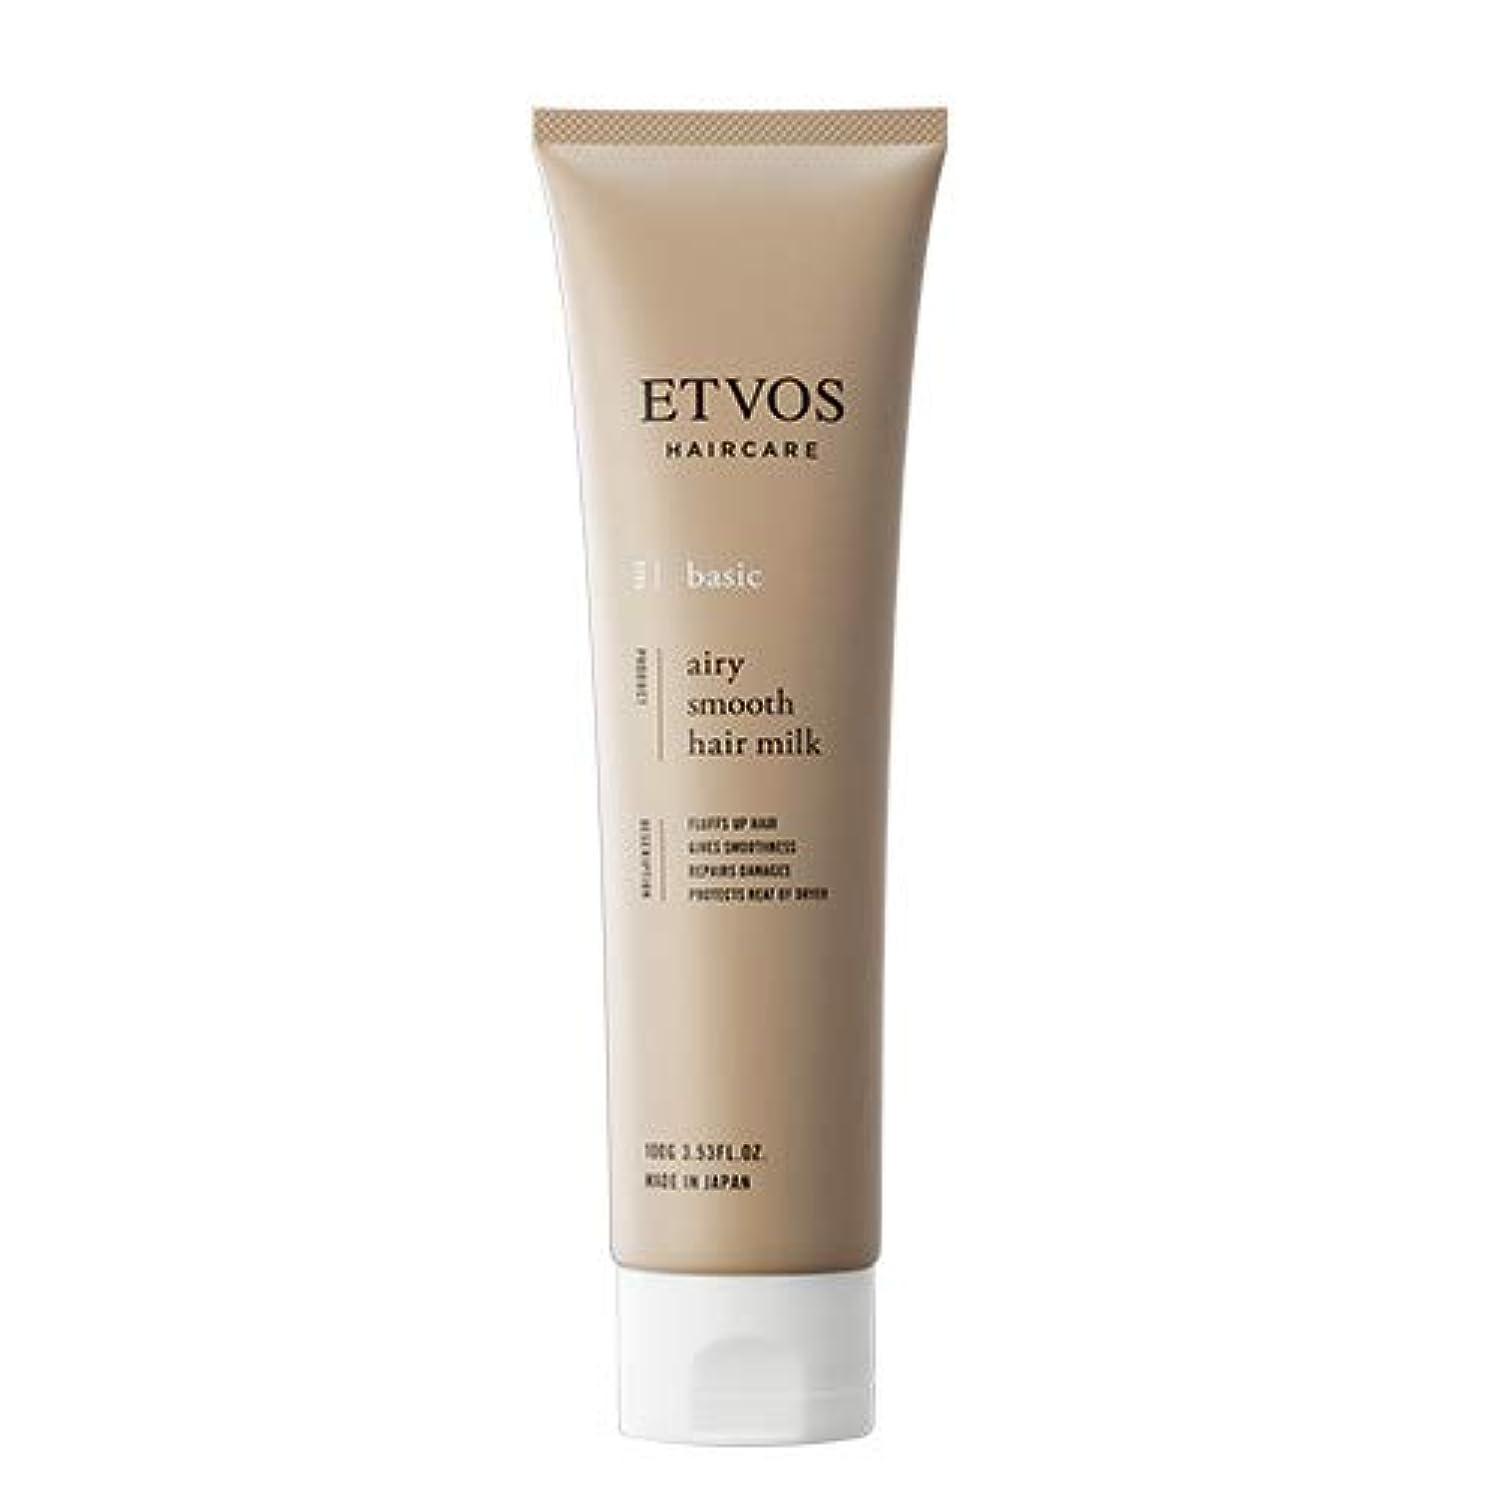 ETVOS(エトヴォス) エアリースムースヘアミルク 100g アウトバストリートメント ノンシリコン/ノンカチオン